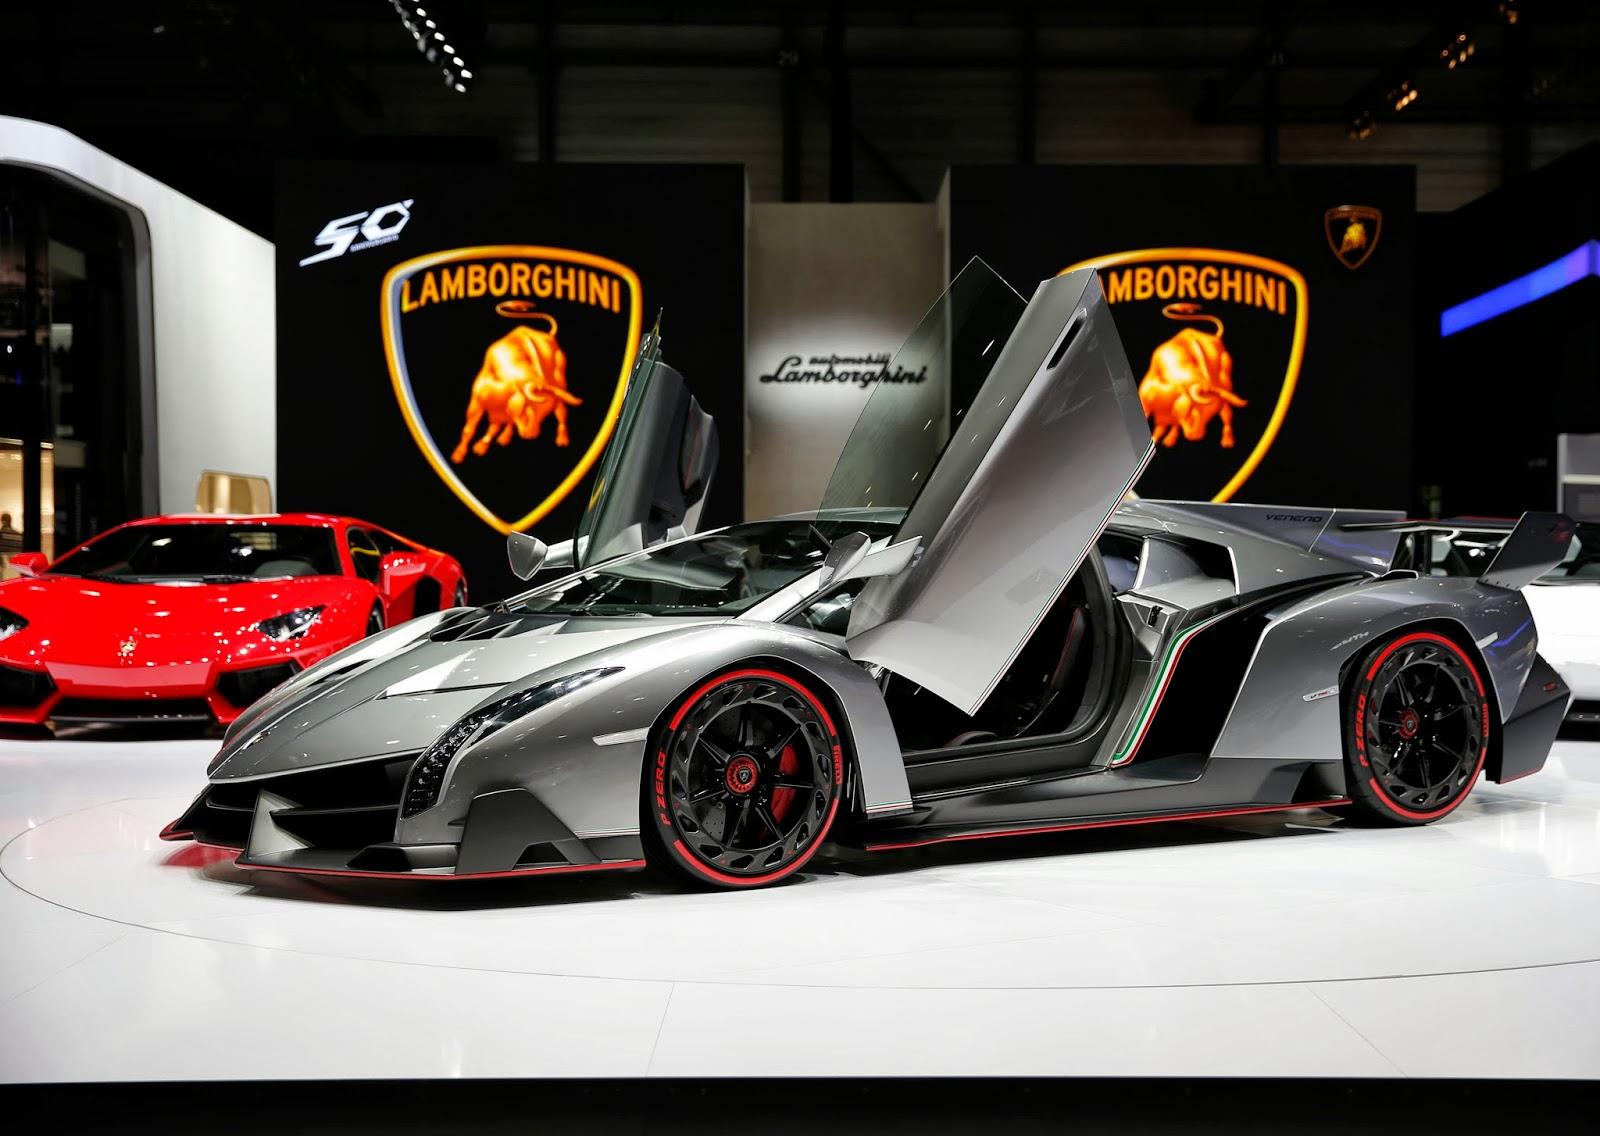 Cool Lamborghini Cars Wallpapers